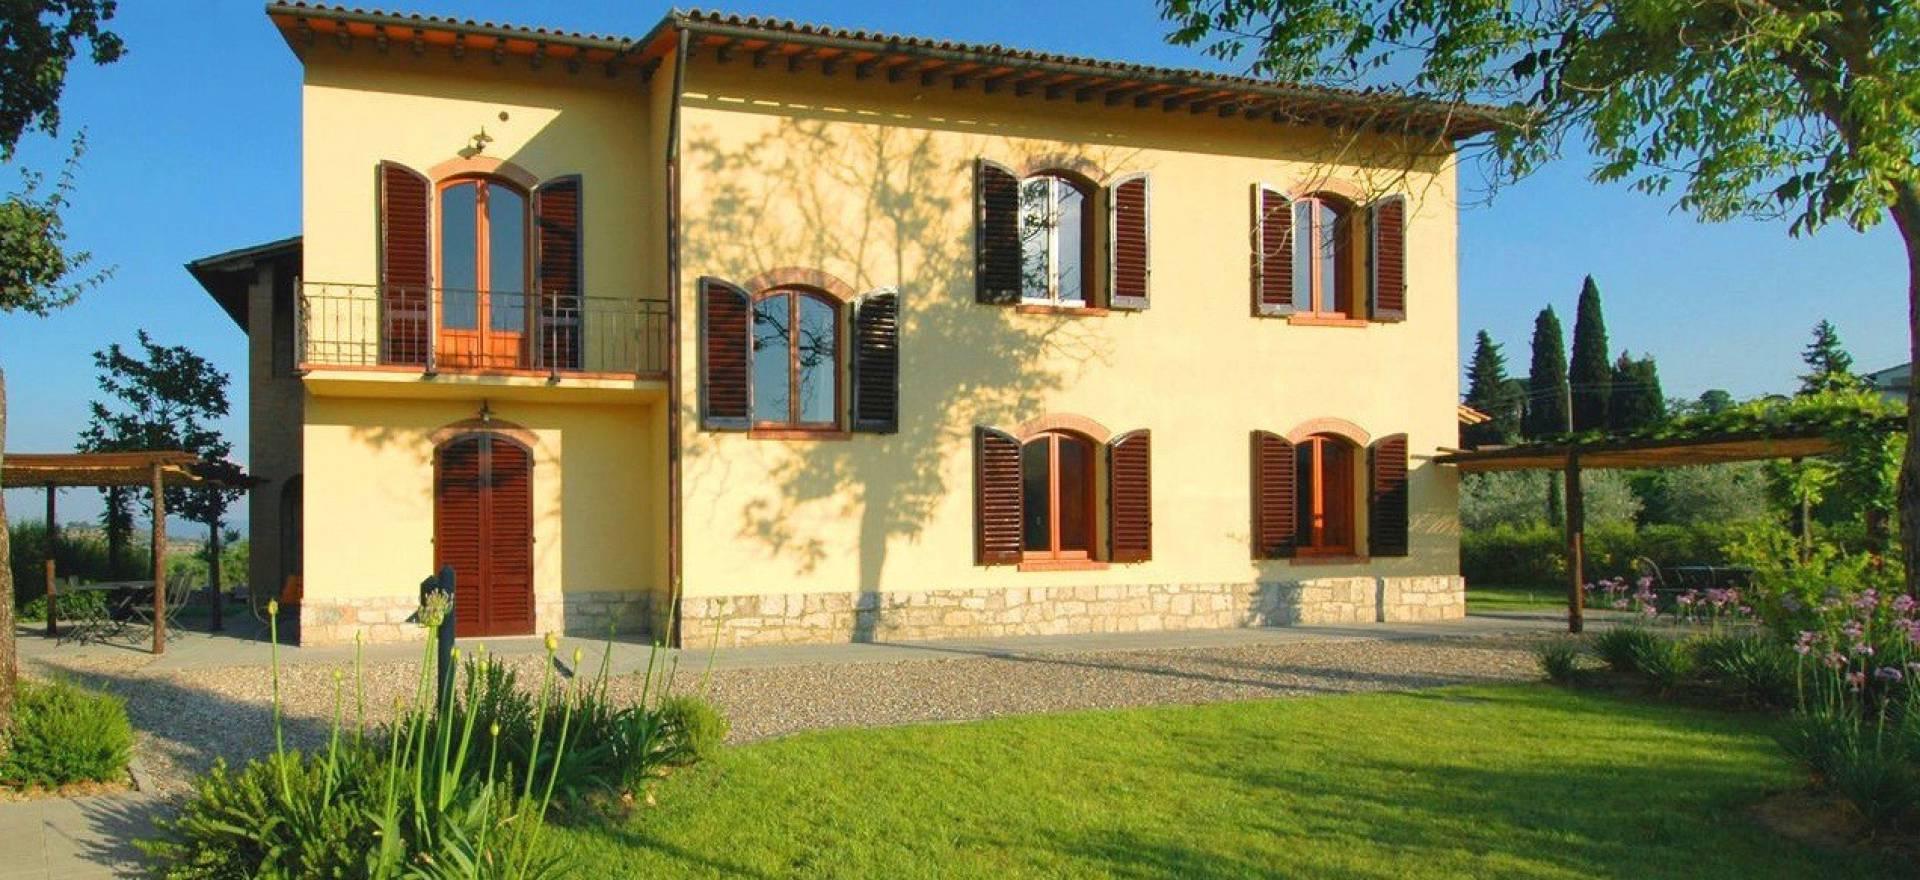 Agriturismo Toscane Agriturismo Toscane, knus en uitzicht op San Gimignano